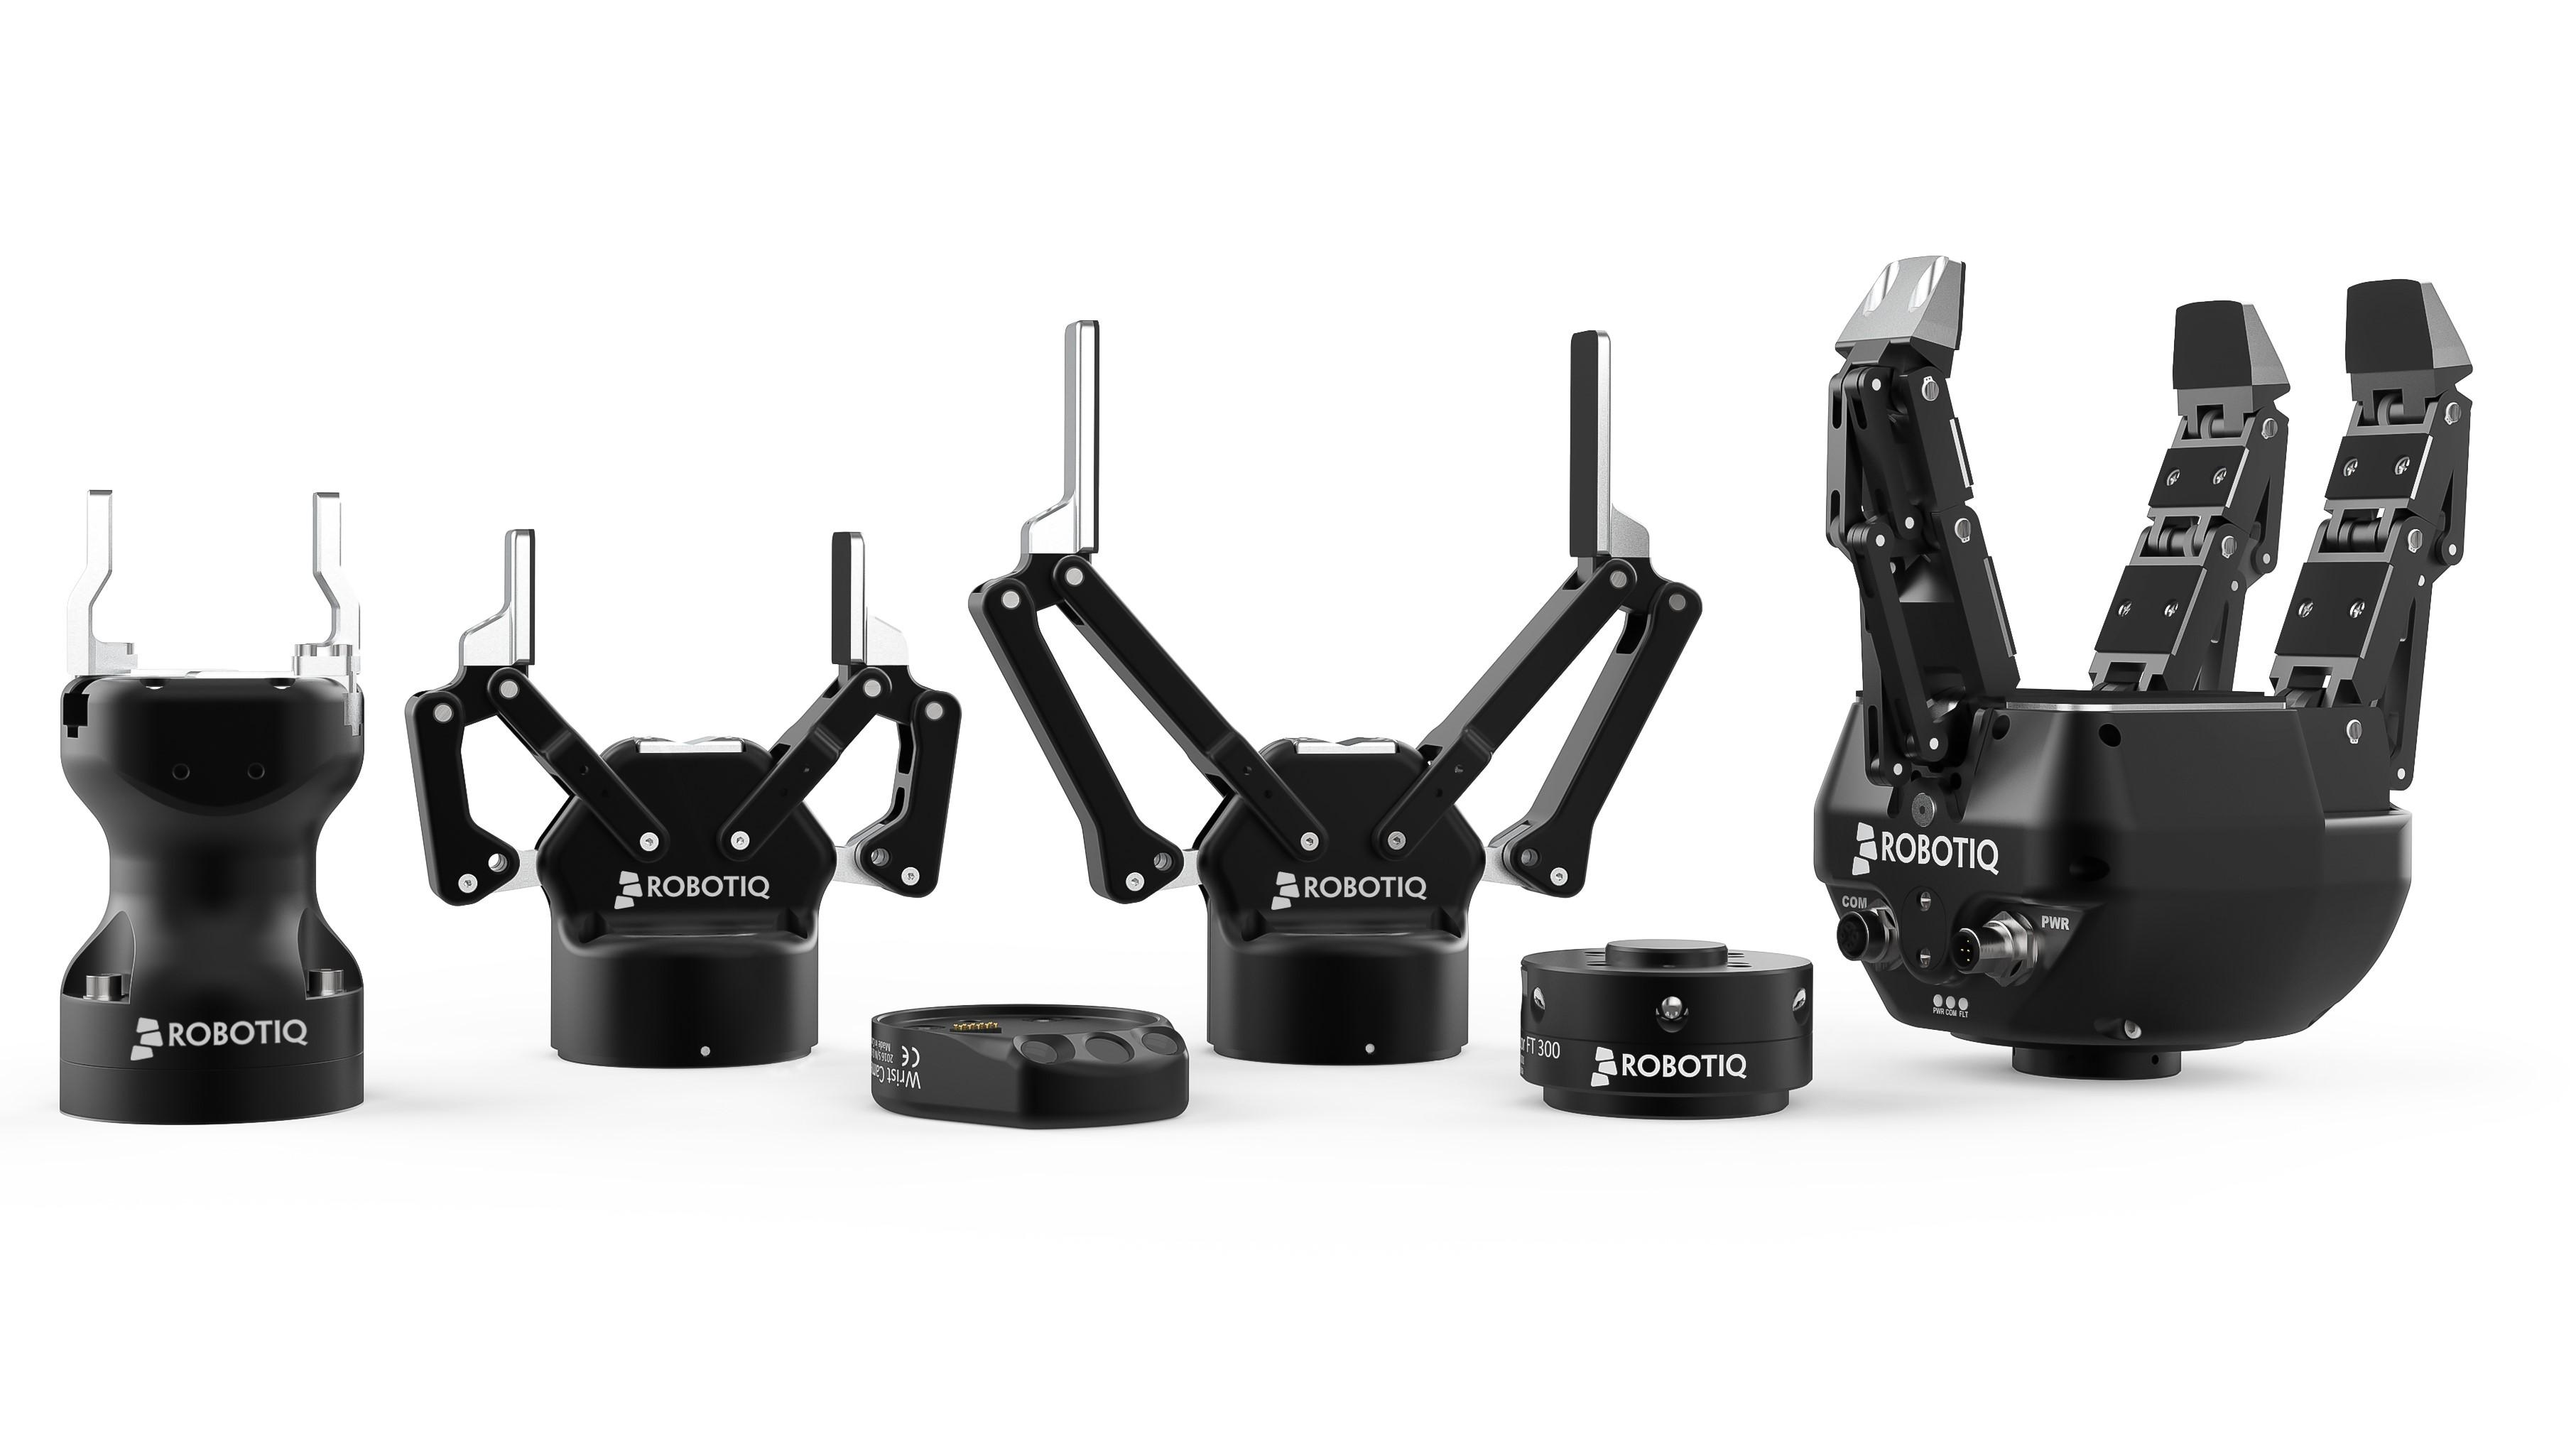 Robotiq-product-line